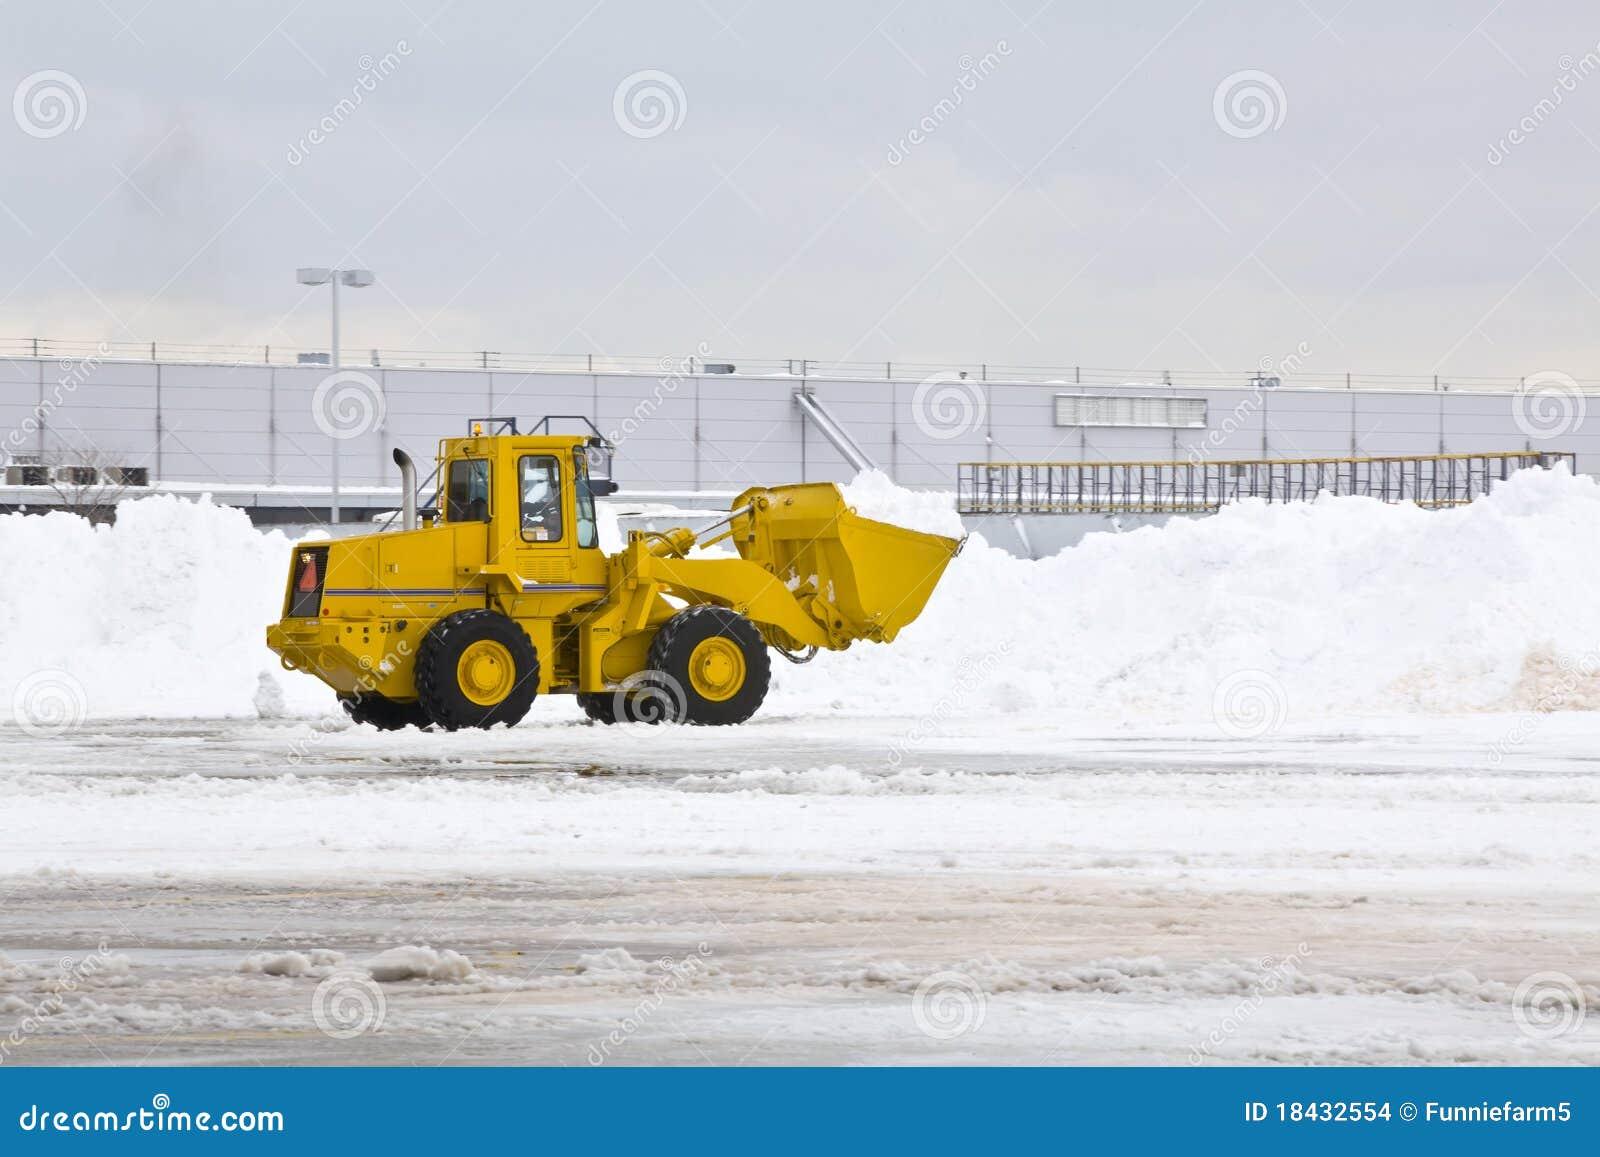 Clip Art Snow Plow